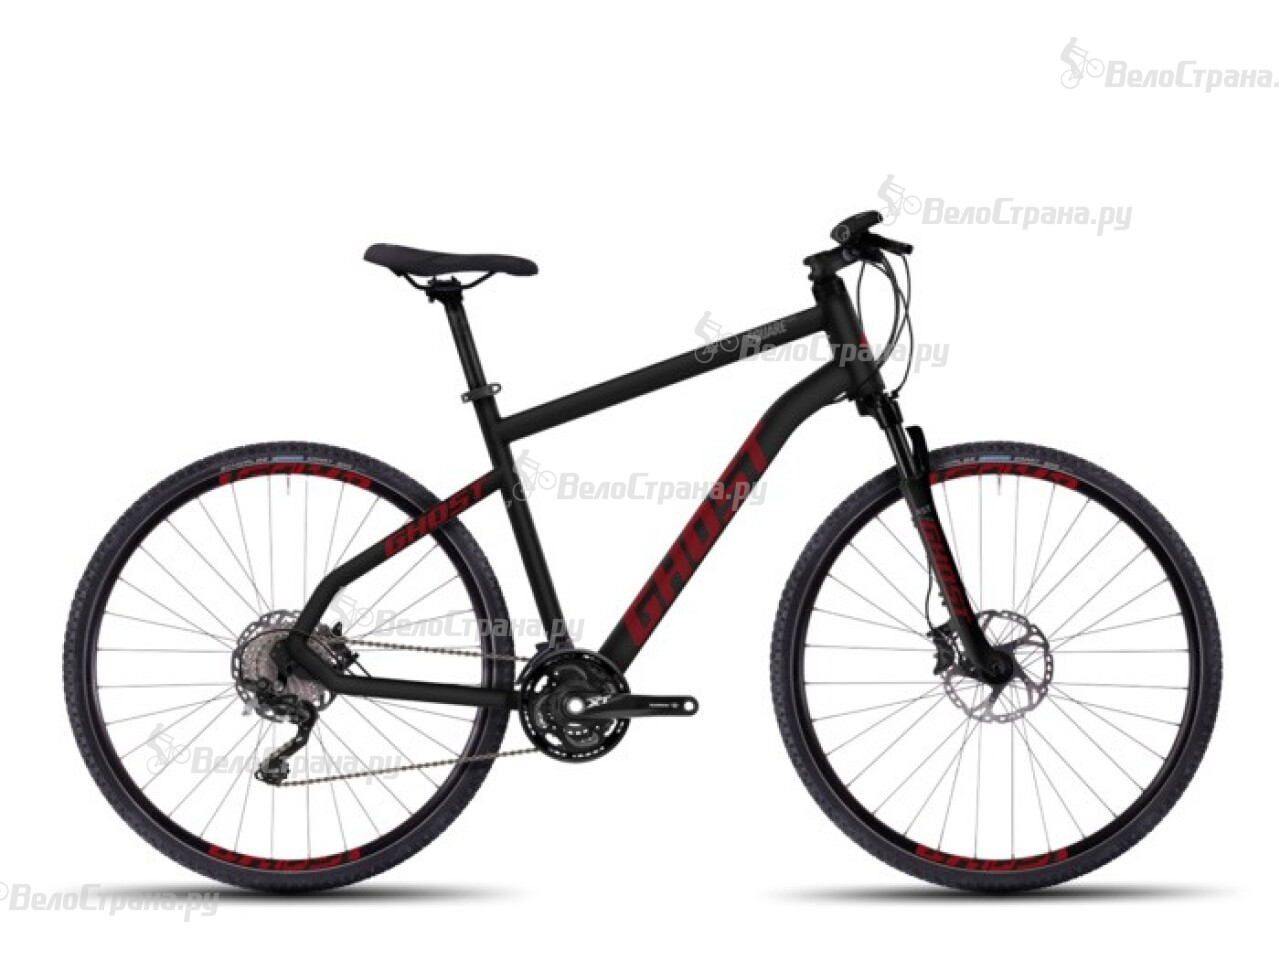 Велосипед Ghost SQUARE Cross 7 (2016) велосипед pegasus piazza gent 7 sp 28 2016